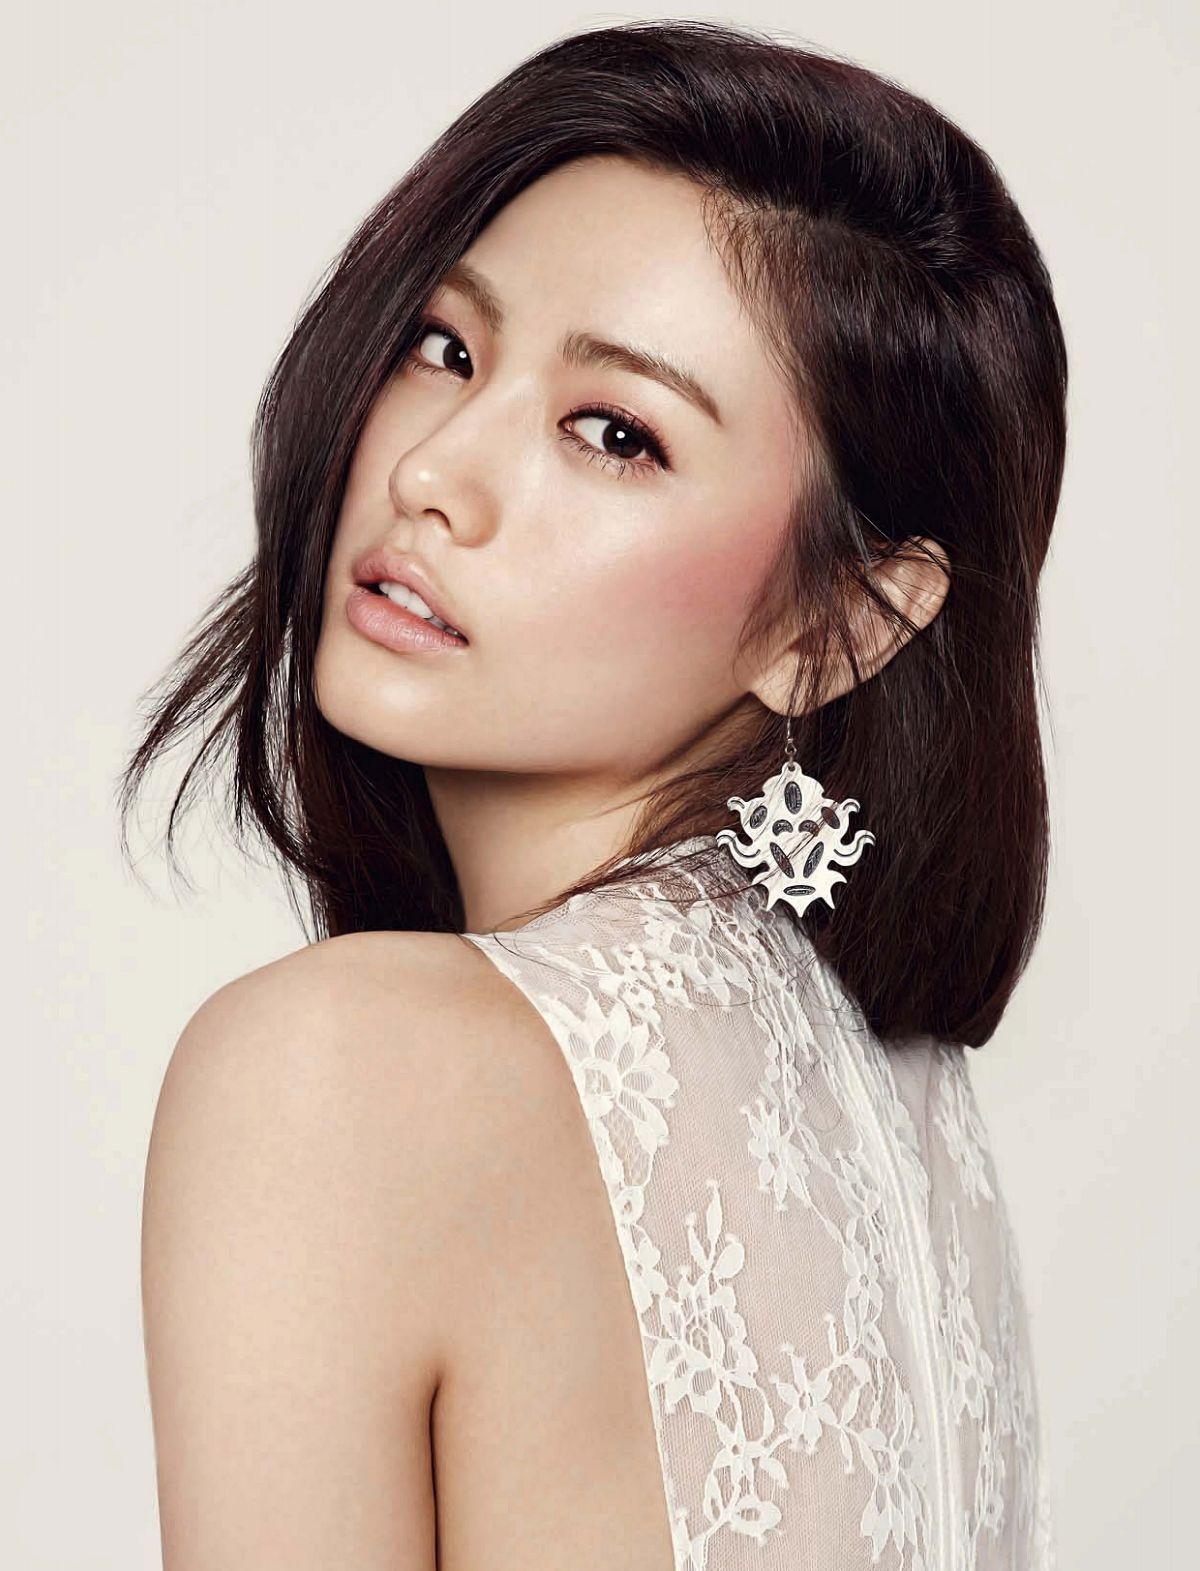 Pin on Asian Beauties